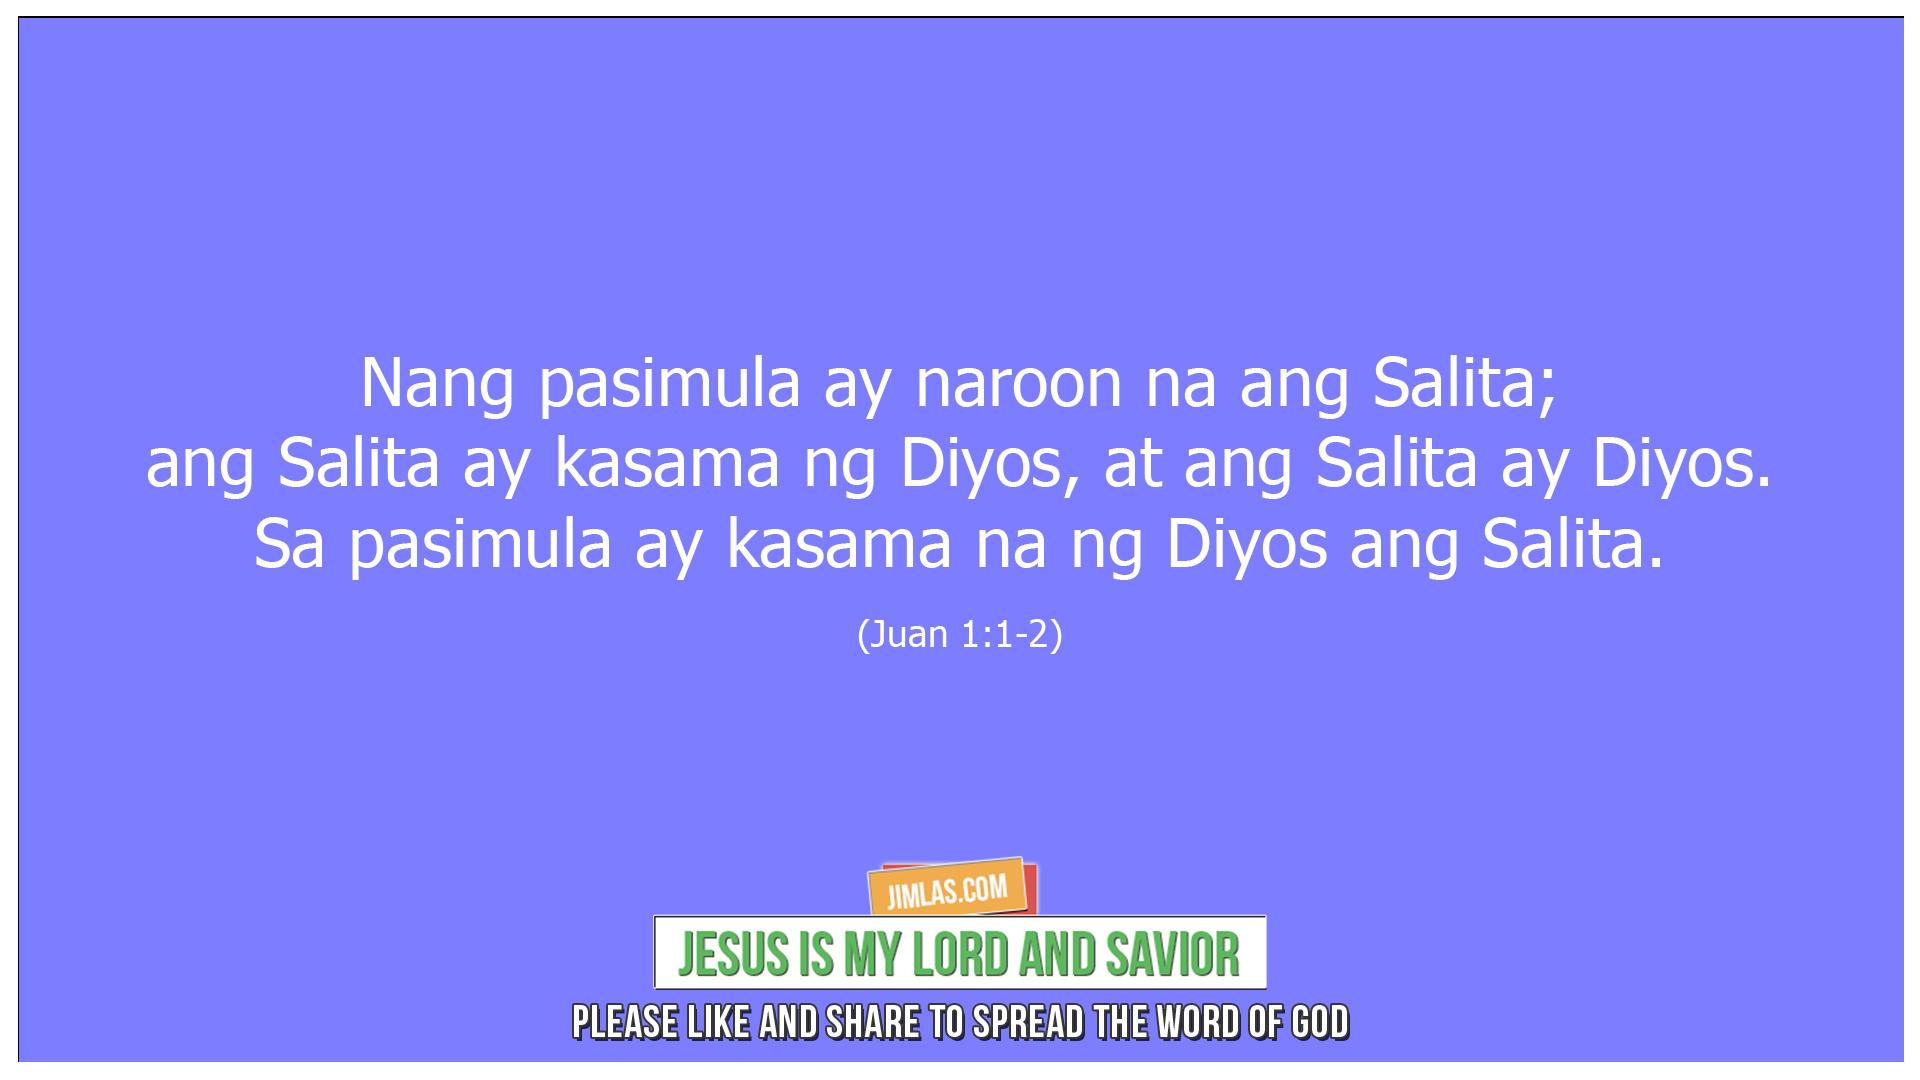 Juan 1 1-2, Juan 1:1-2